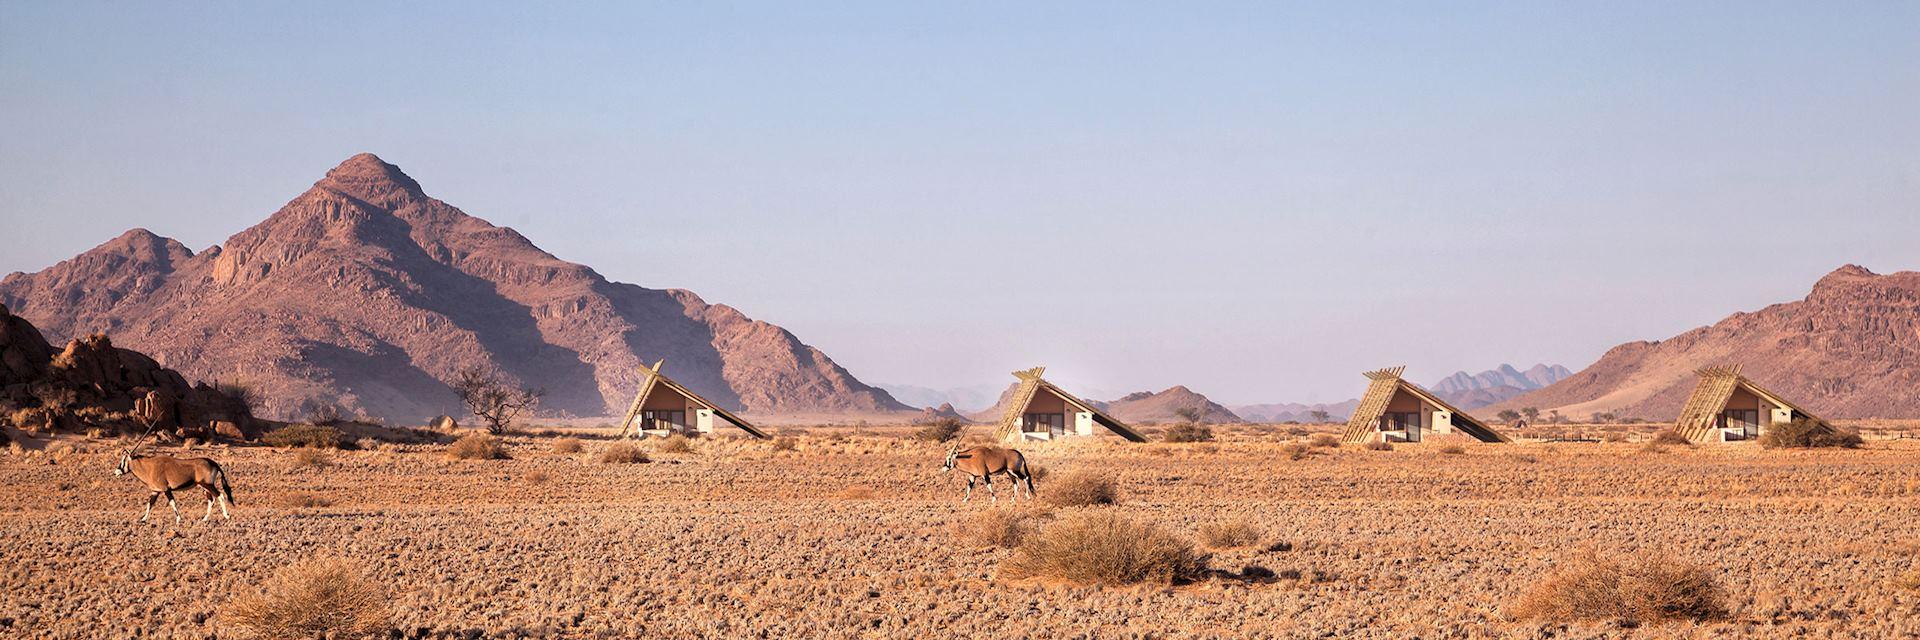 Desert Quiver Camp, Namibia